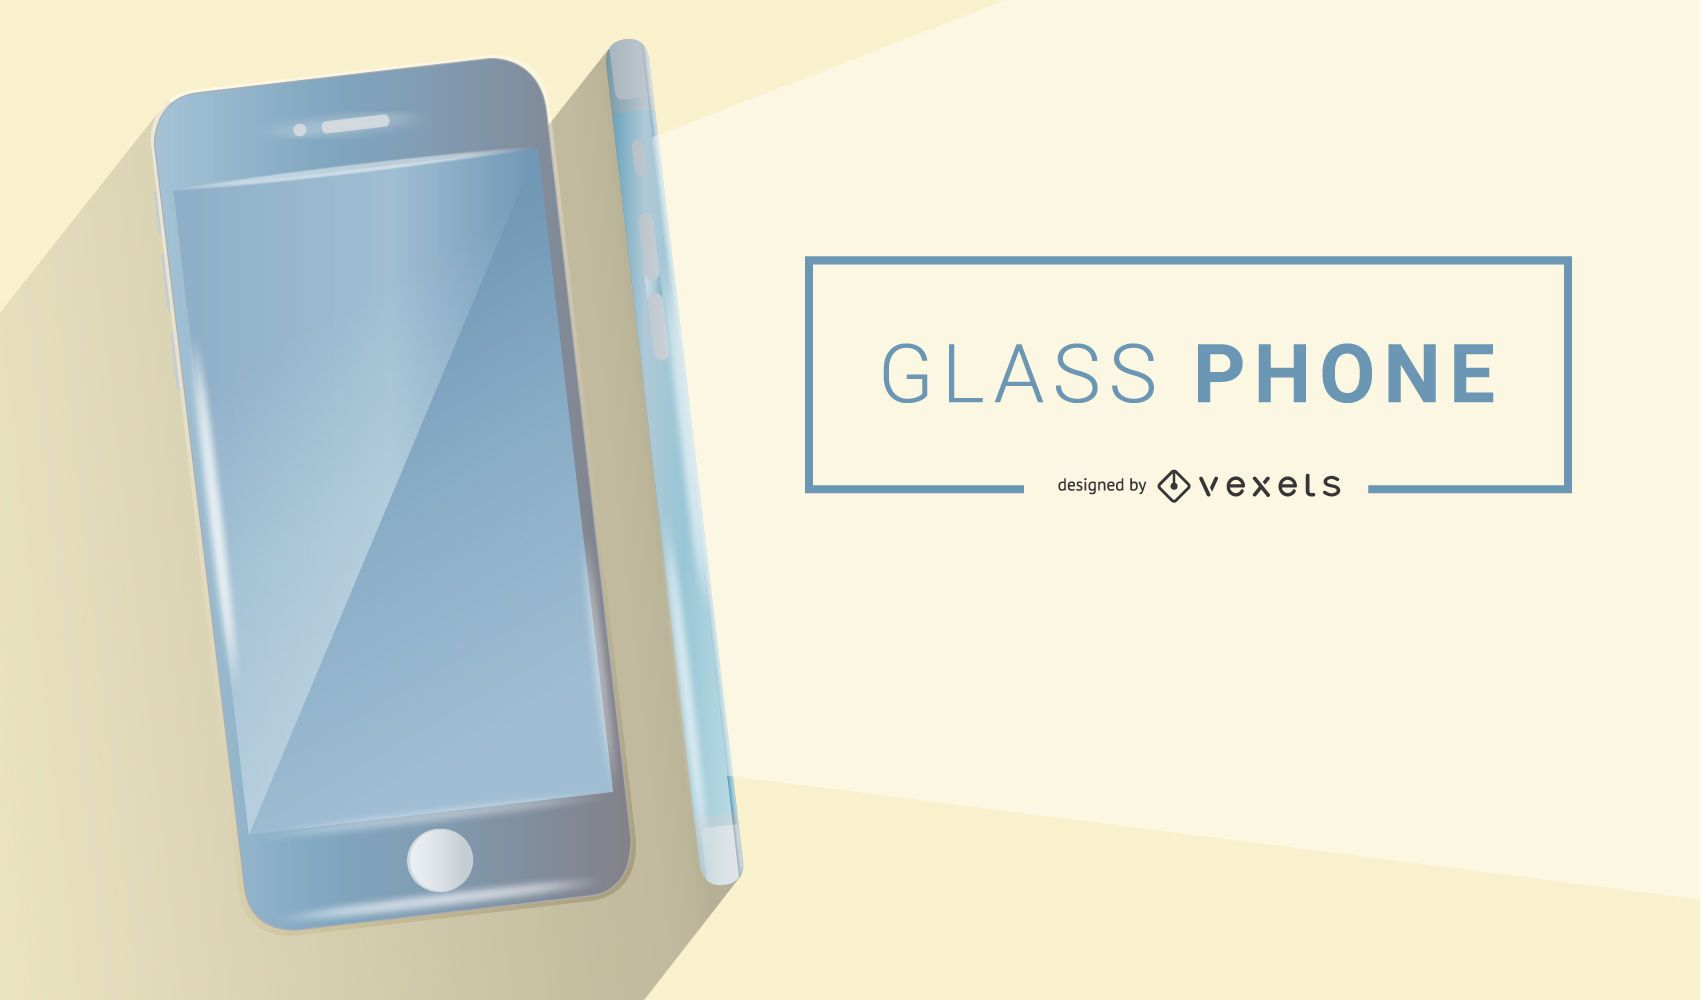 Teléfono de cristal futurista